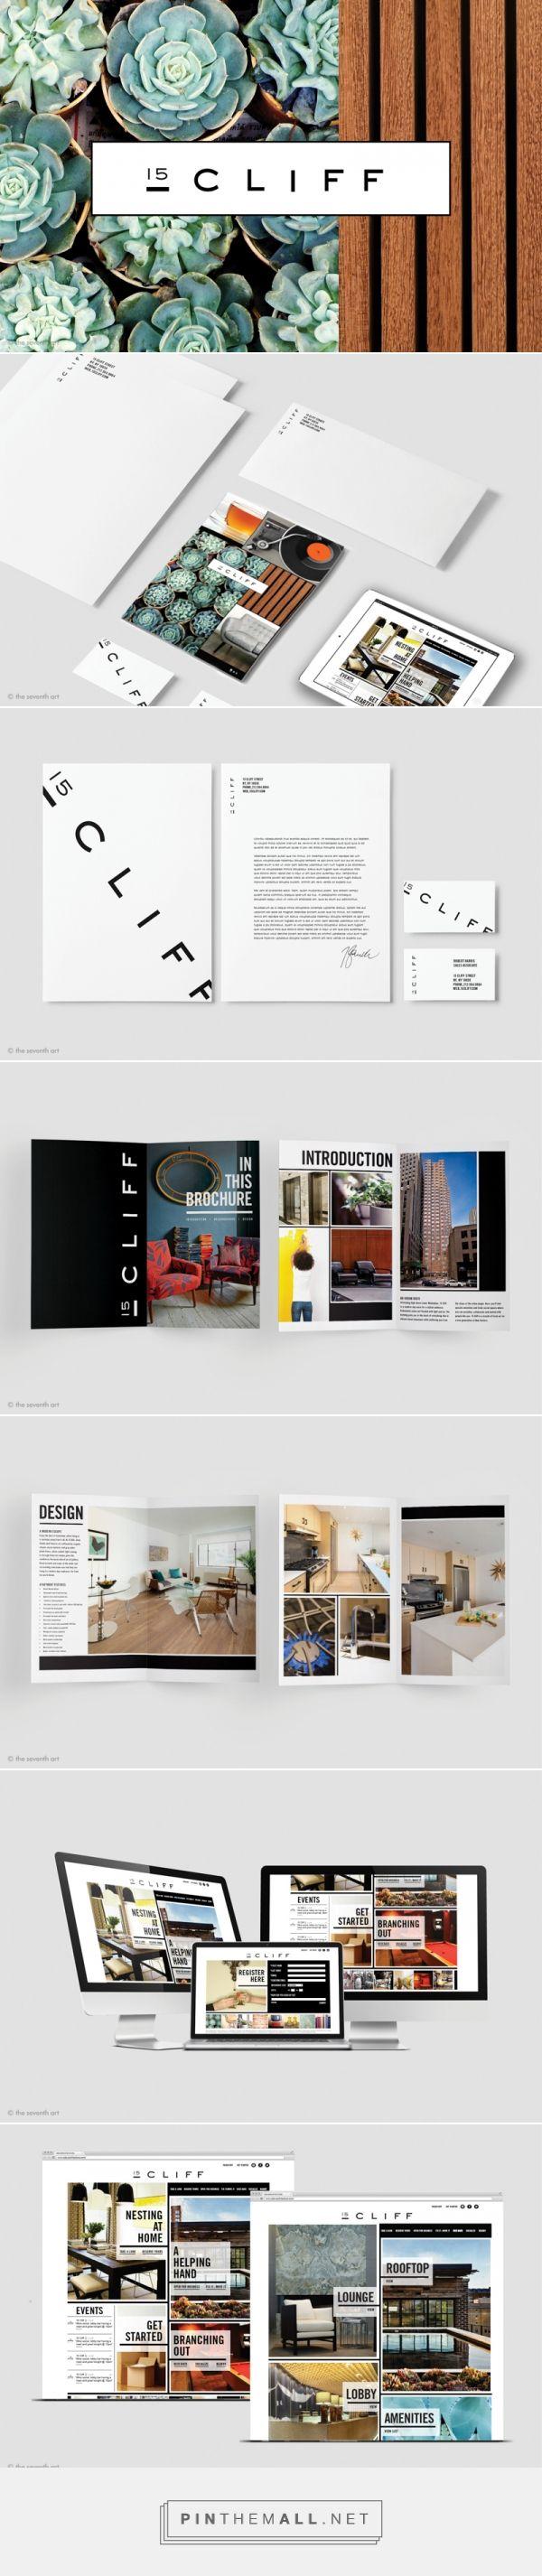 15 Cliff Residential Branding by The Seventh Art LLC   Fivestar Branding – Design and Branding Agency & Inspiration Gallery